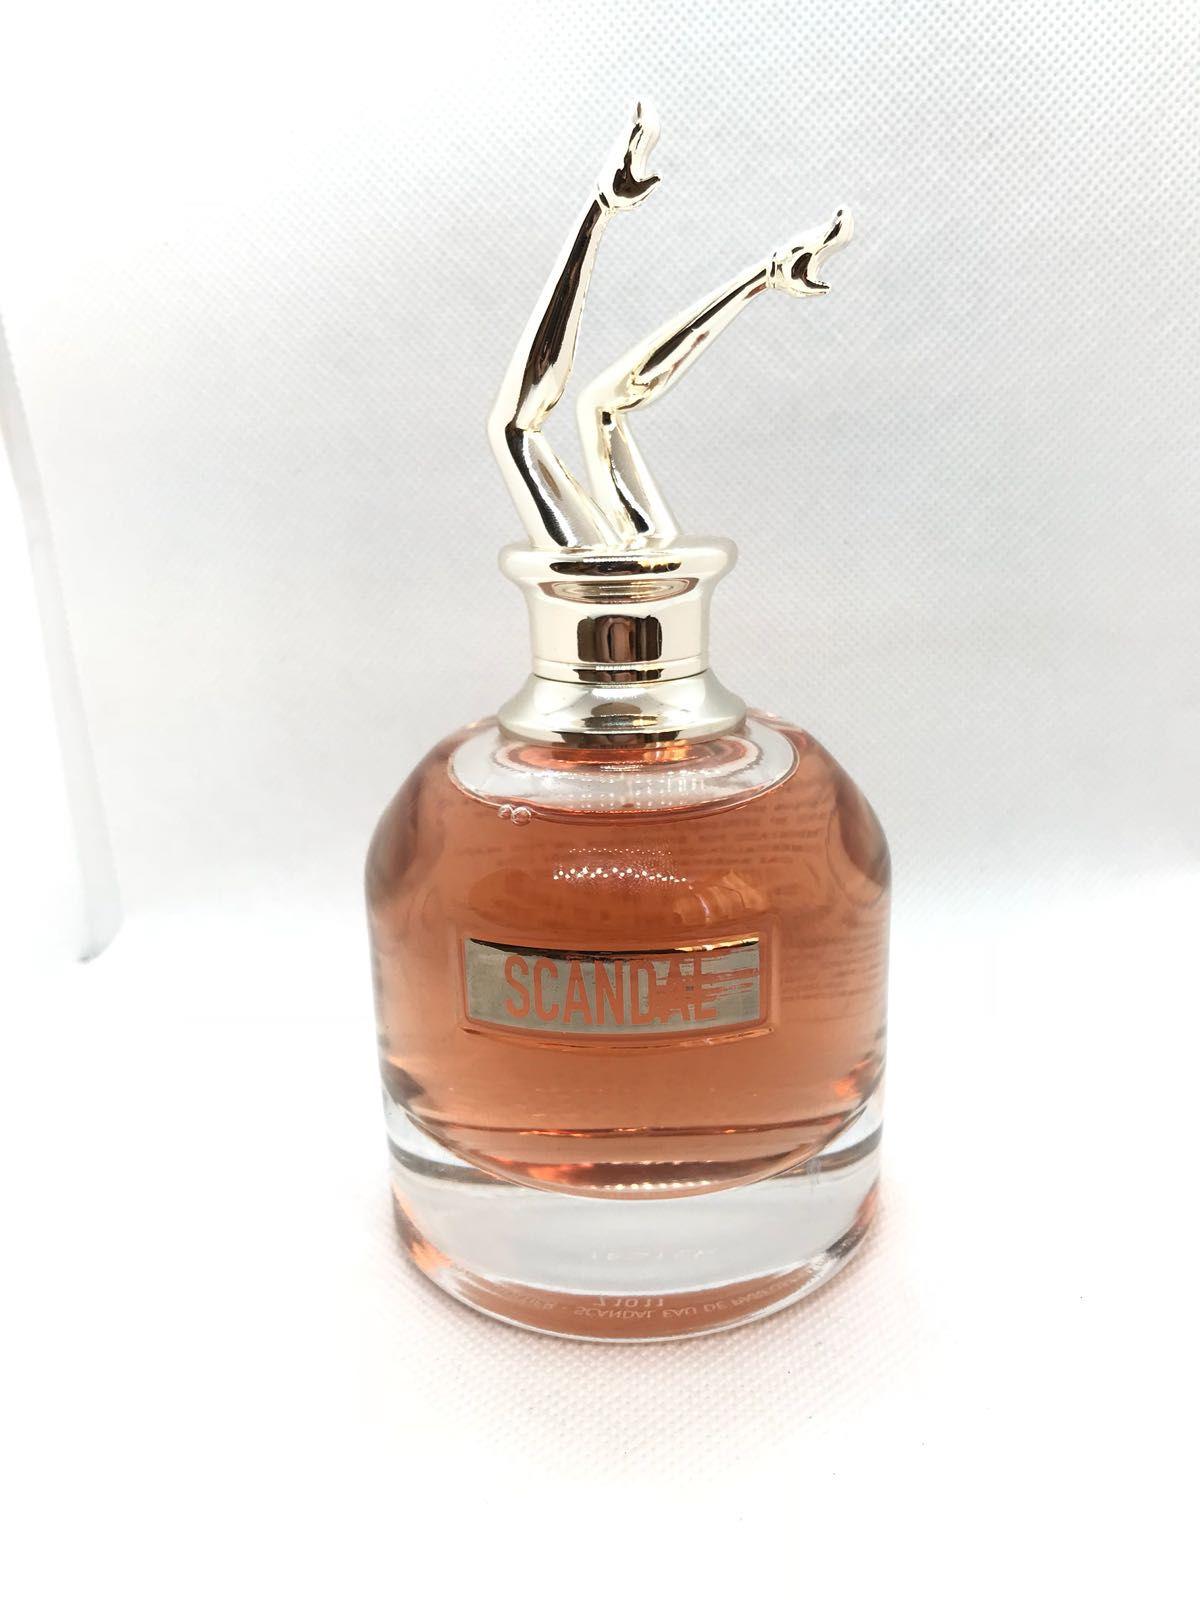 Scandal Jean Paul Gaultier Feminino Eau de Parfum 80ML - Tester